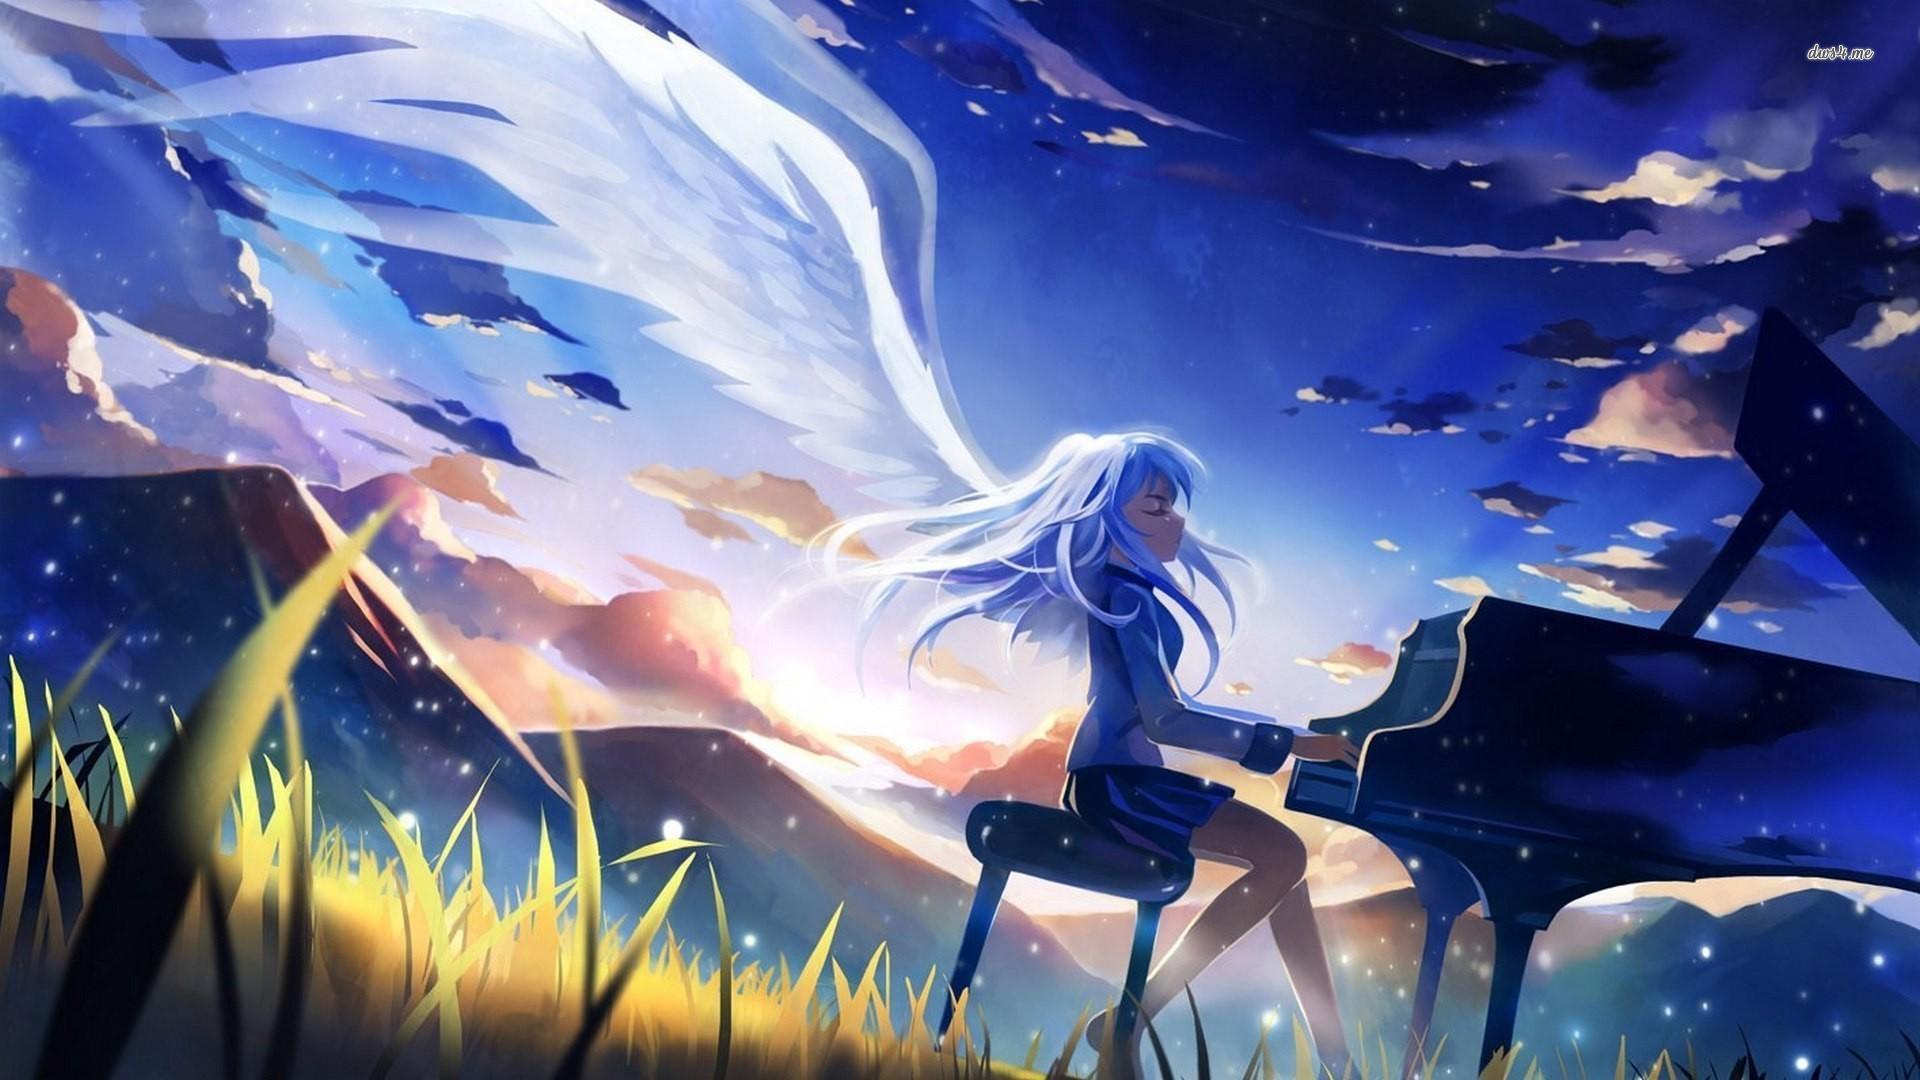 Angel angel beats wallpapers hd 402954 1920x1080